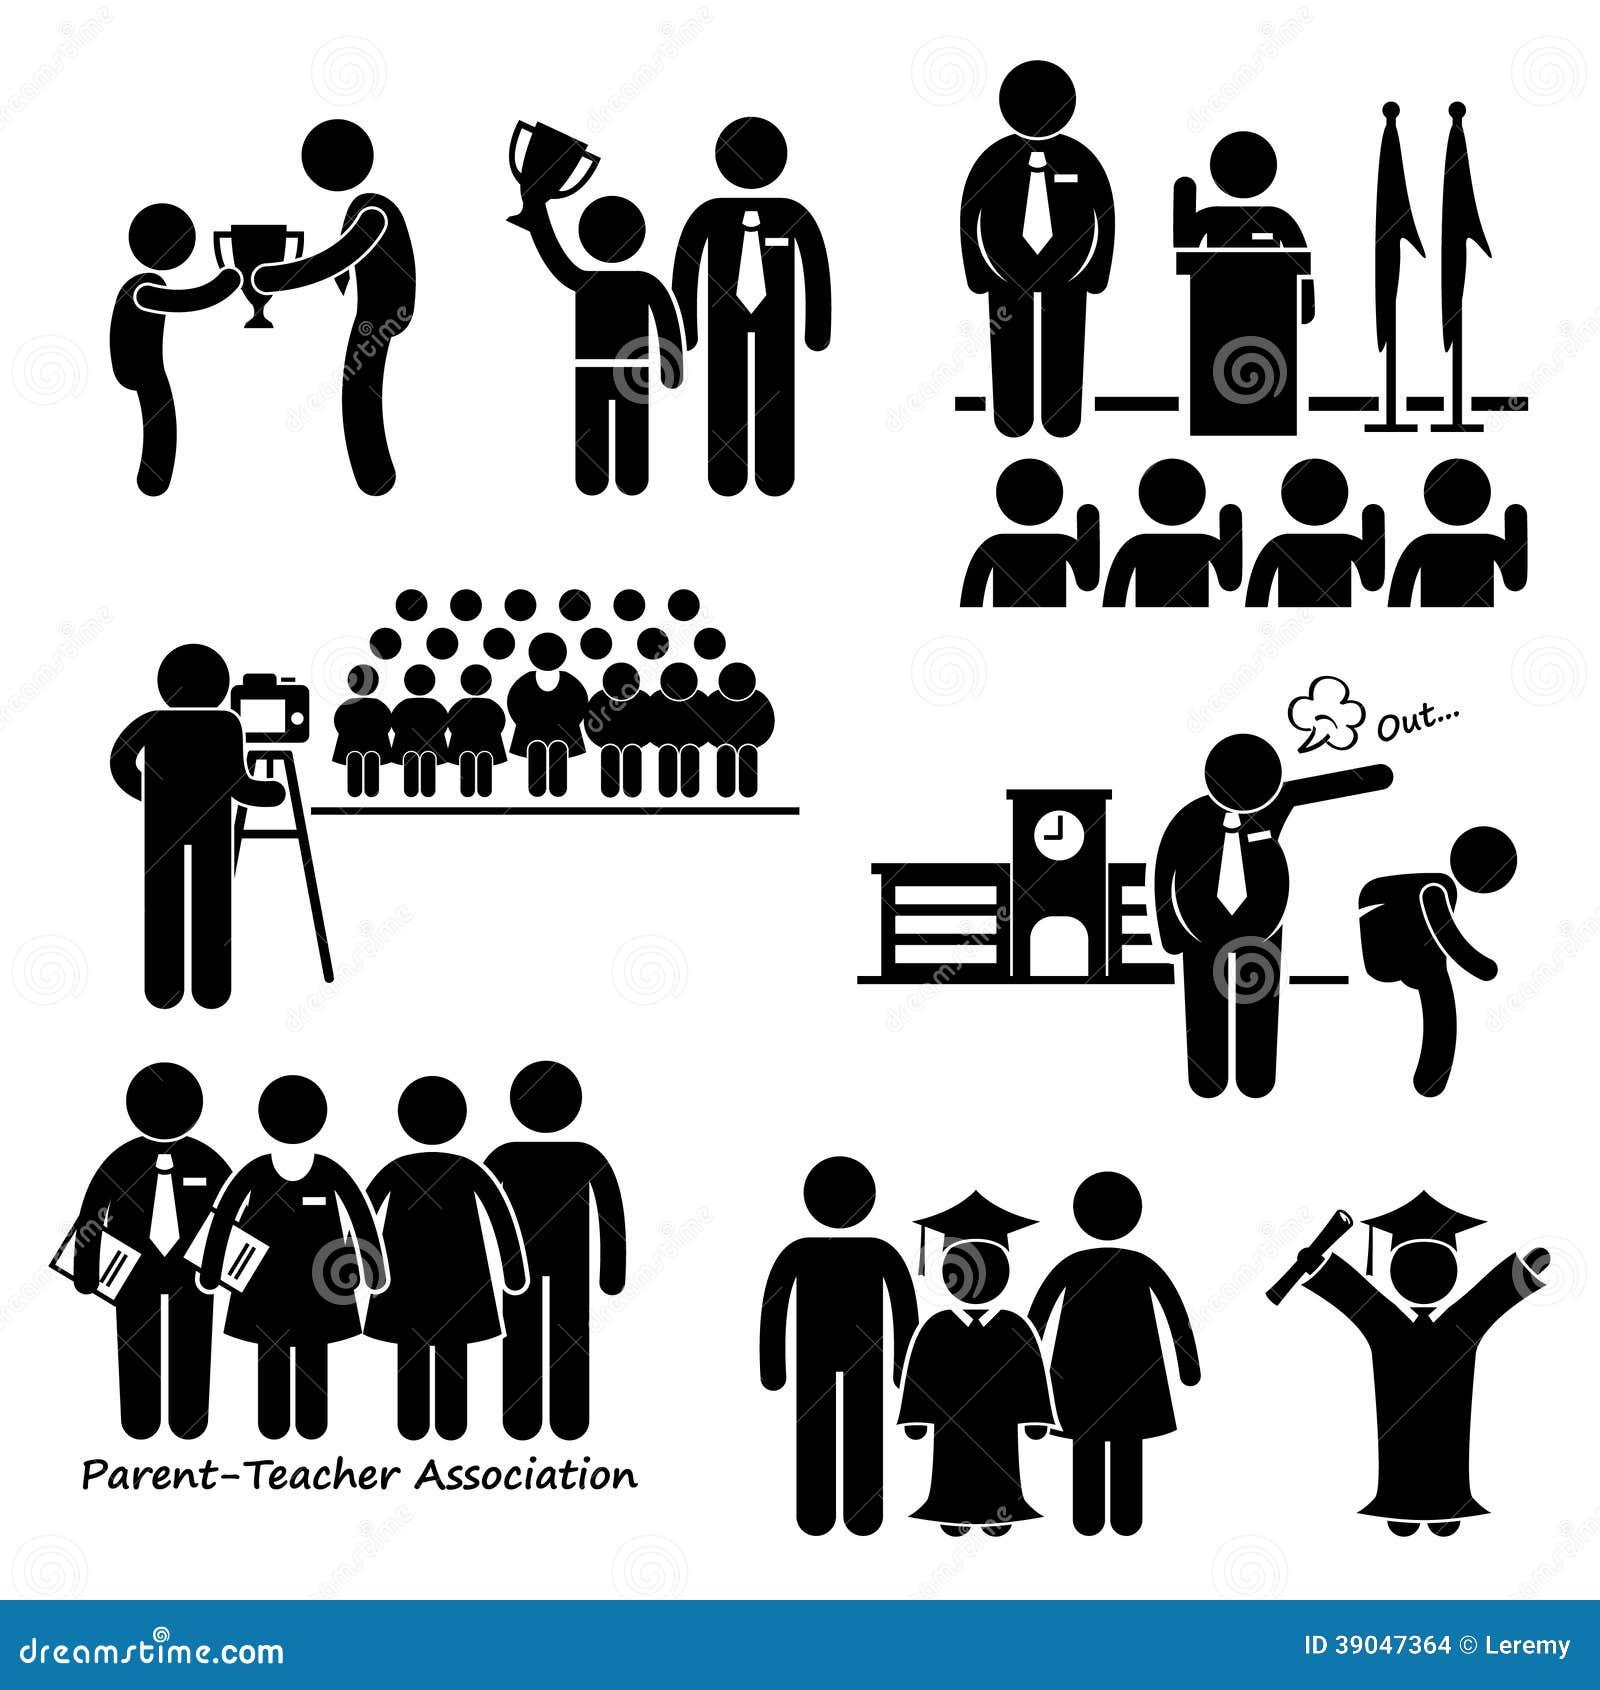 school events clipart stock vector illustration of people 39047364 rh dreamstime com Schoolhouse Clip Art Organization Clip Art